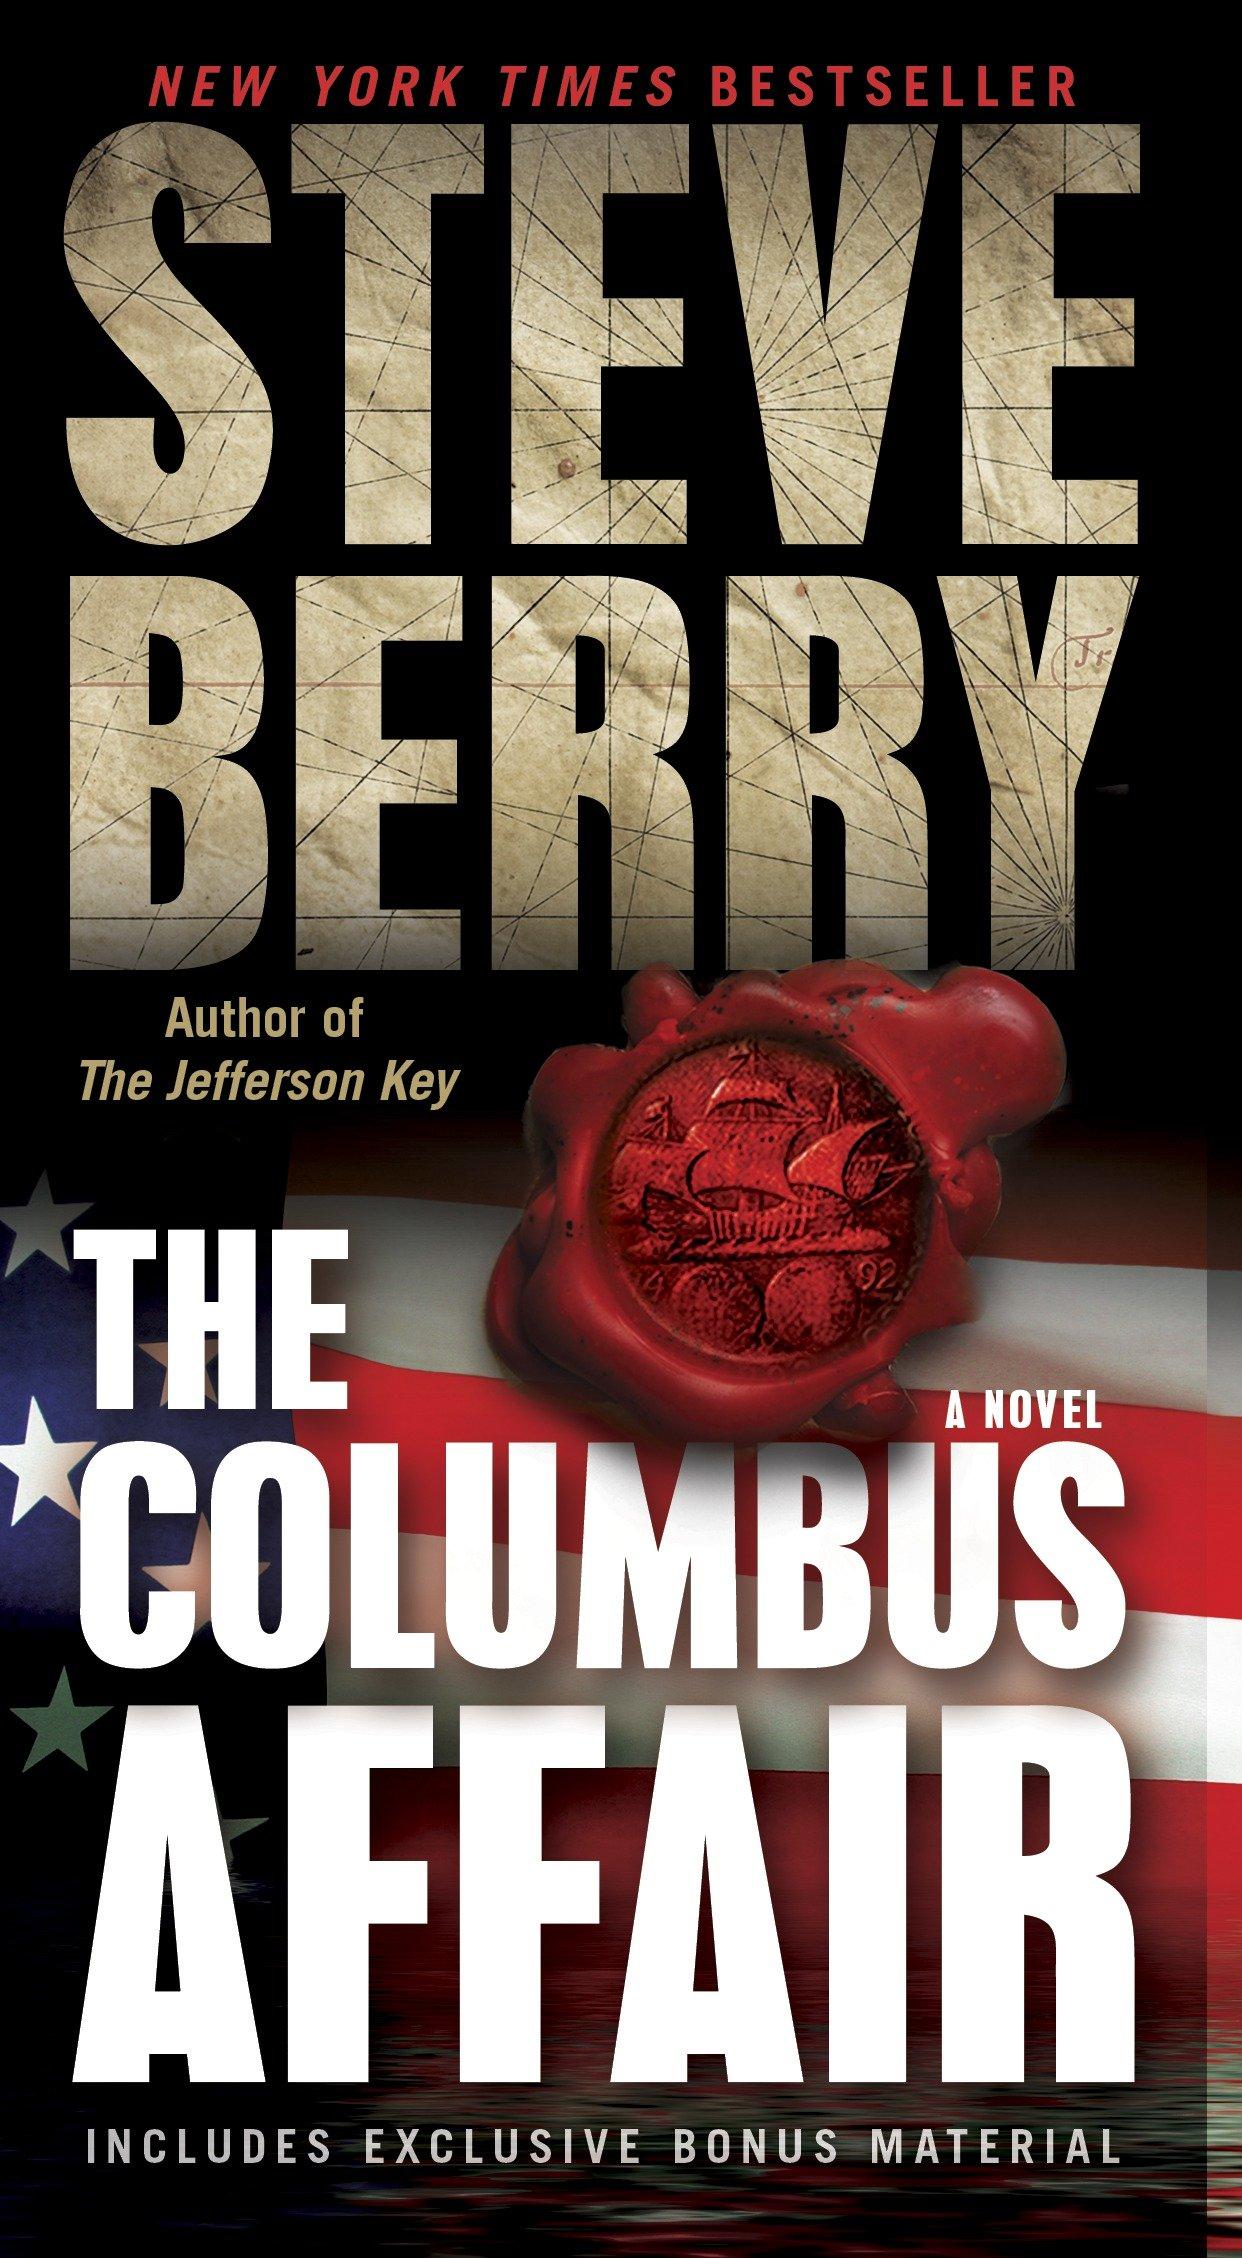 The Columbus affair: a novel (with bonus short story the Admiral's Mark) cover image